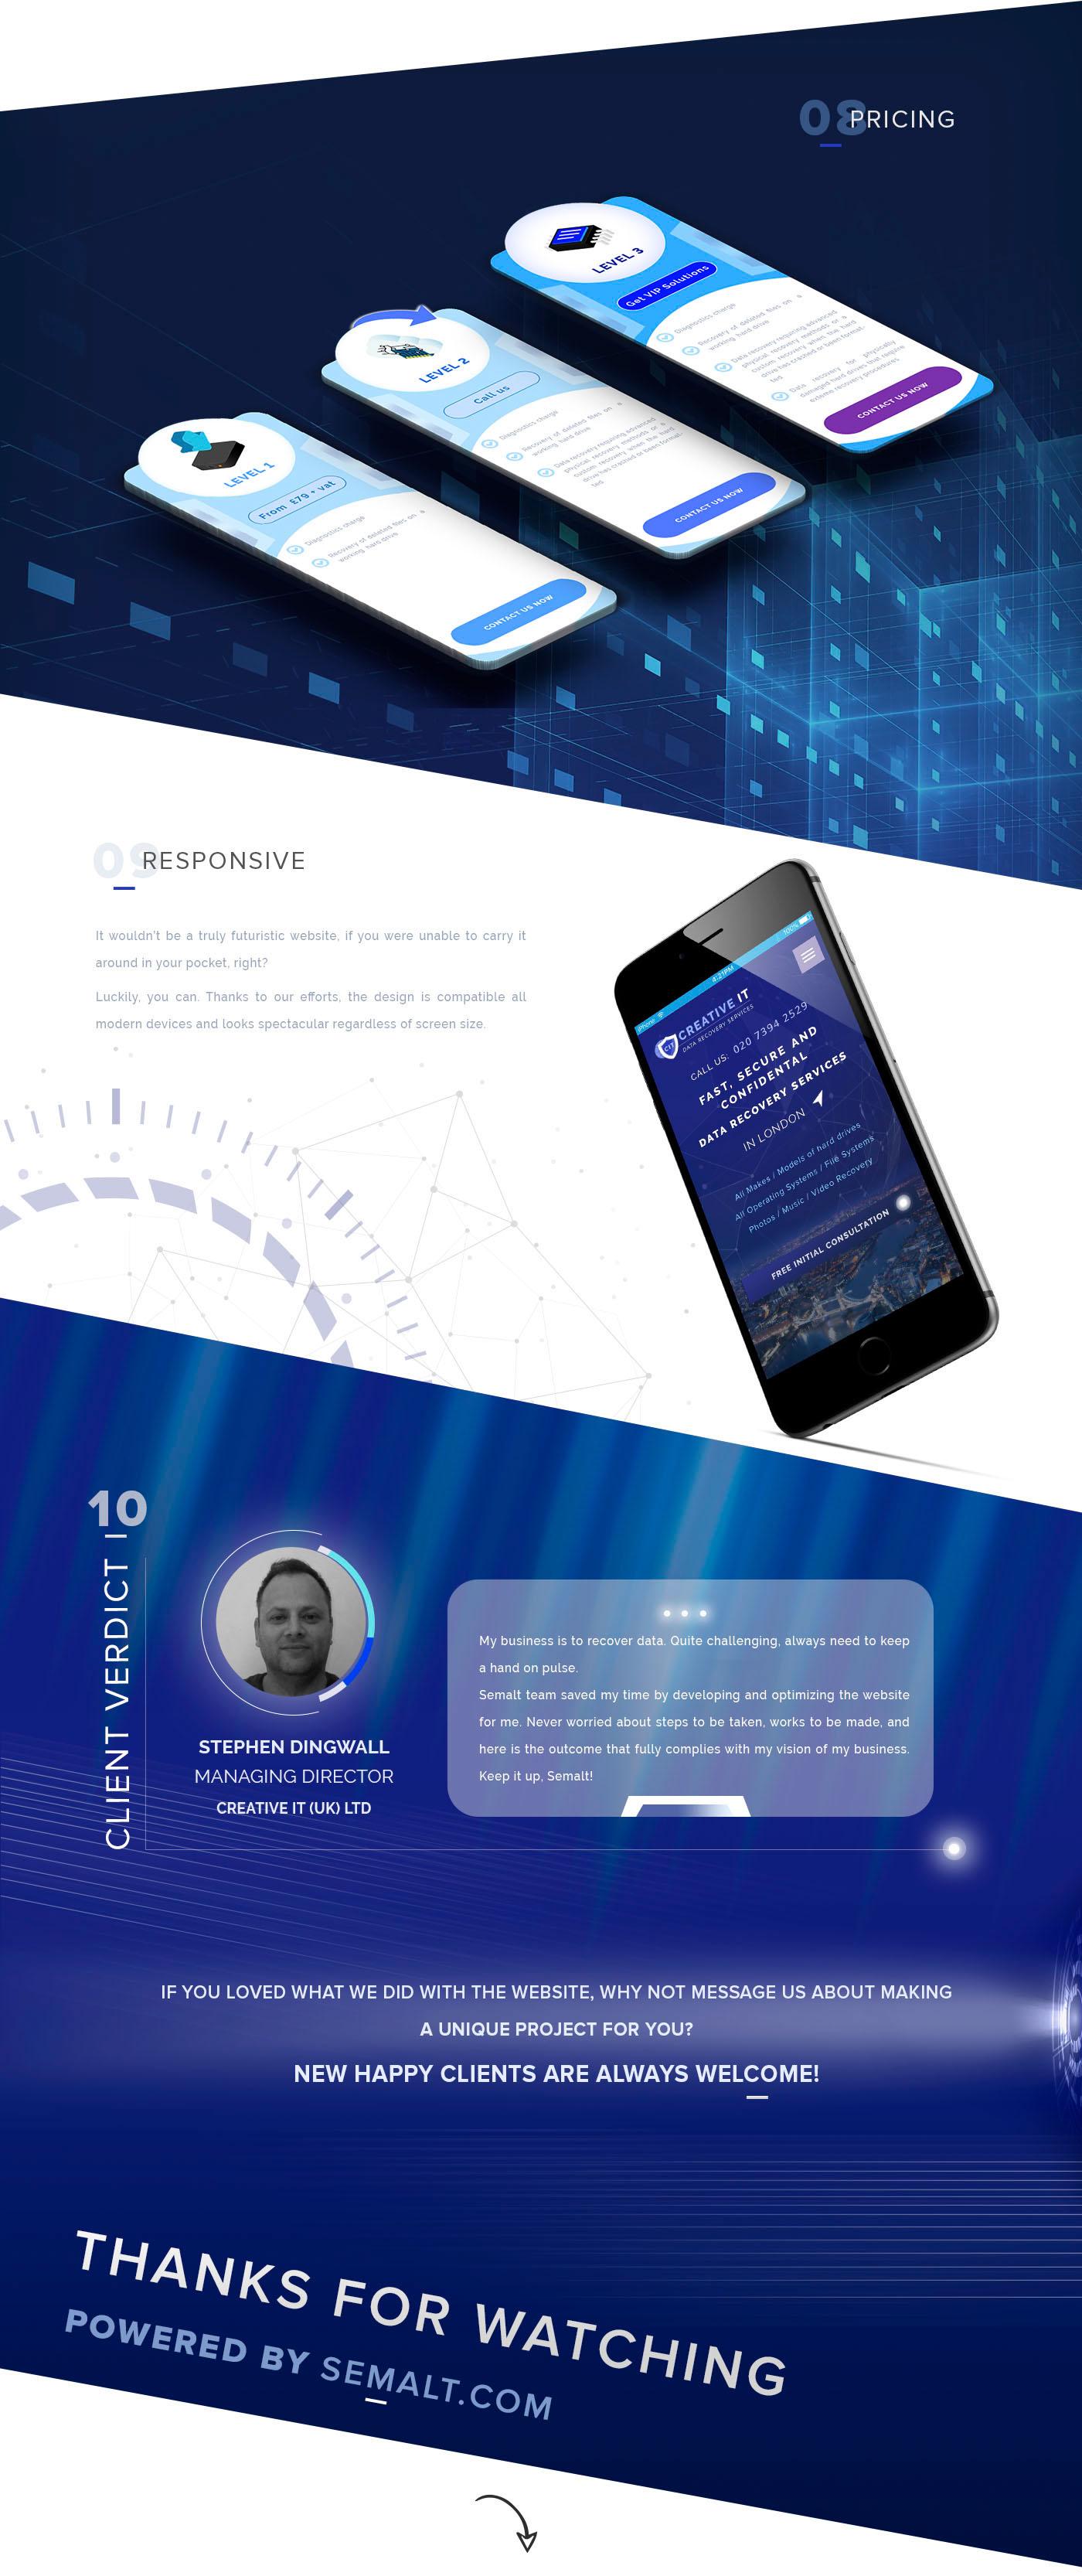 Space  star wars site ux/ui semalt technologies IT data recovery trend purple